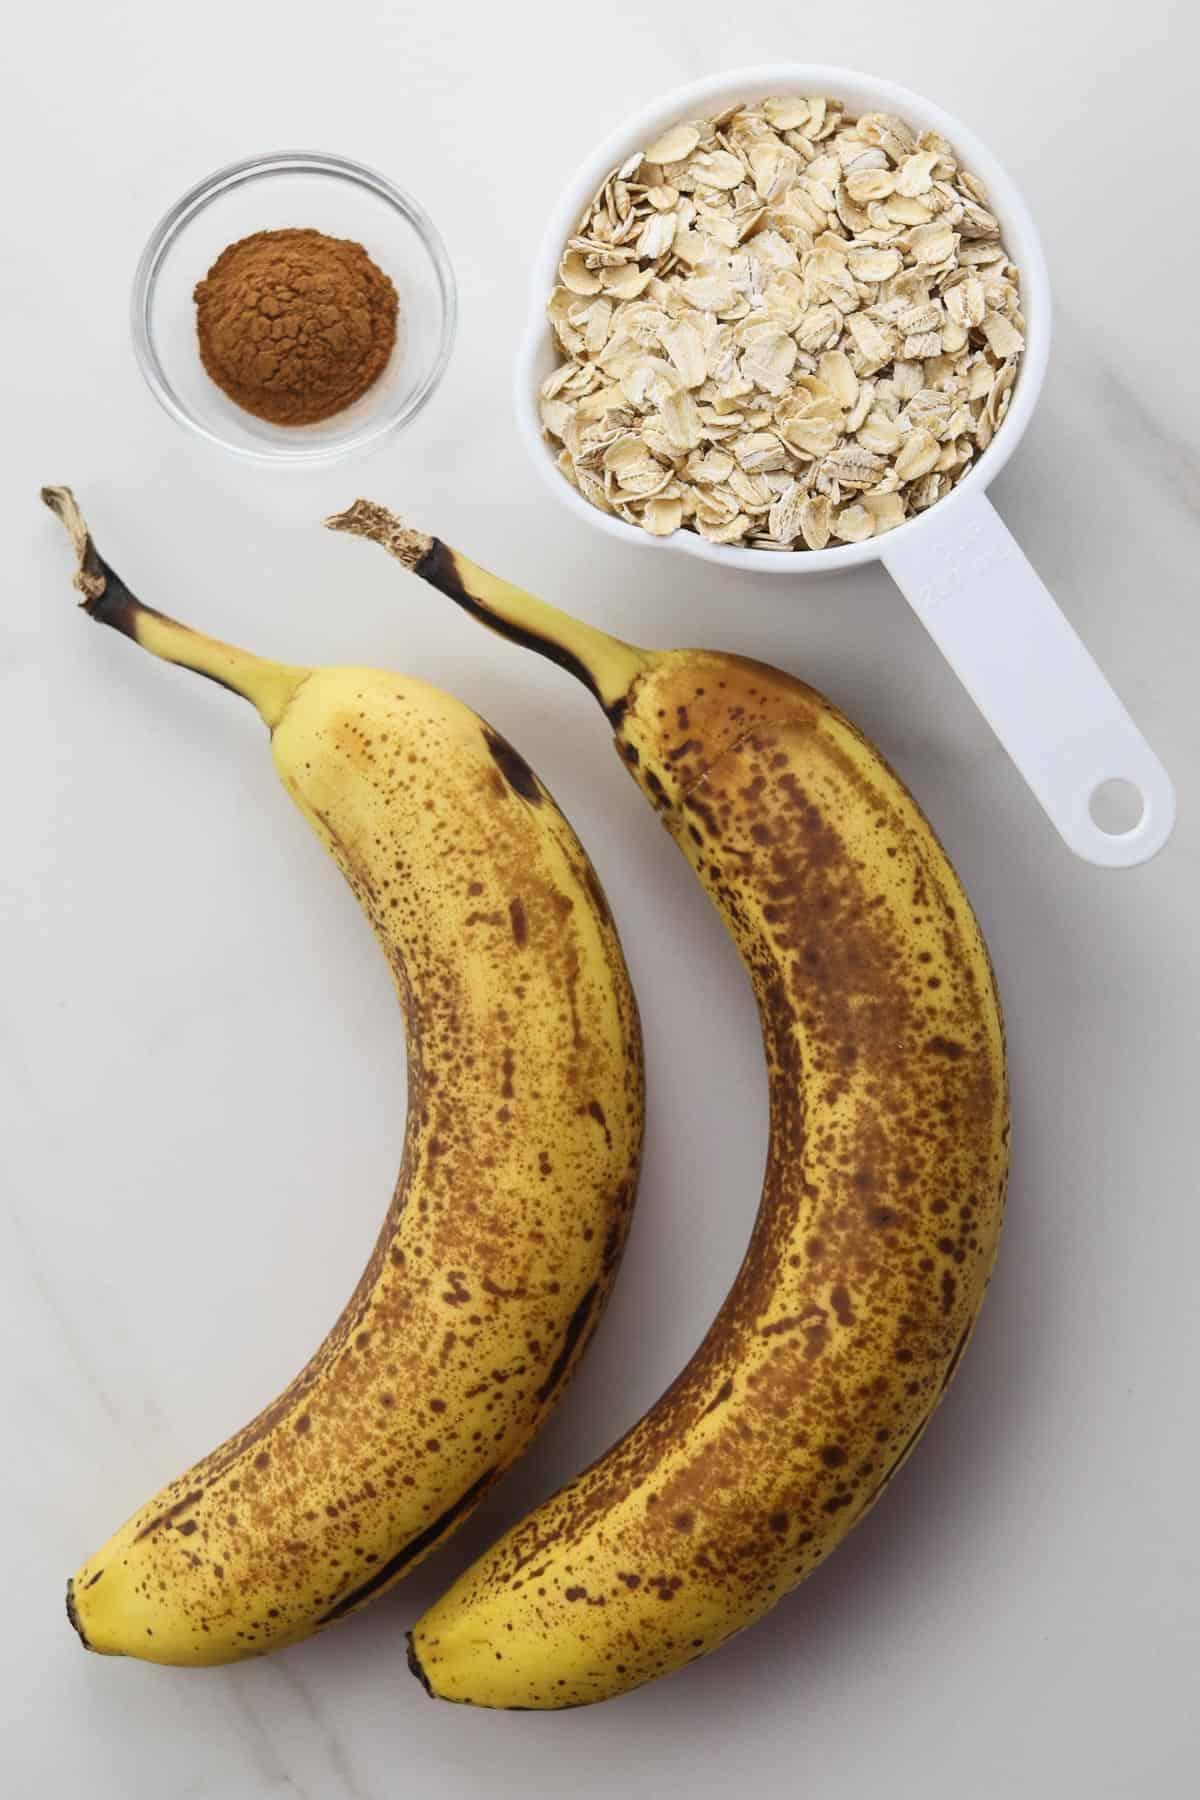 3 ingredients for banana oatmeal cookies